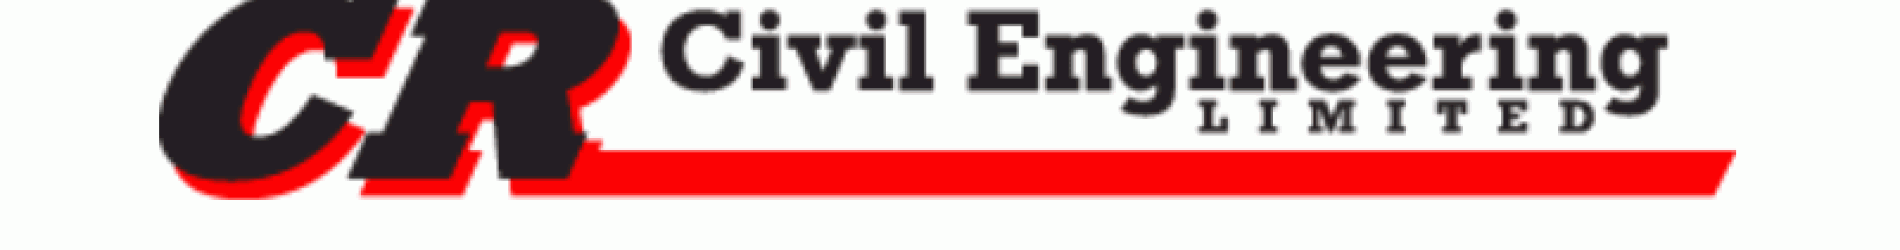 CR Civil Engineering